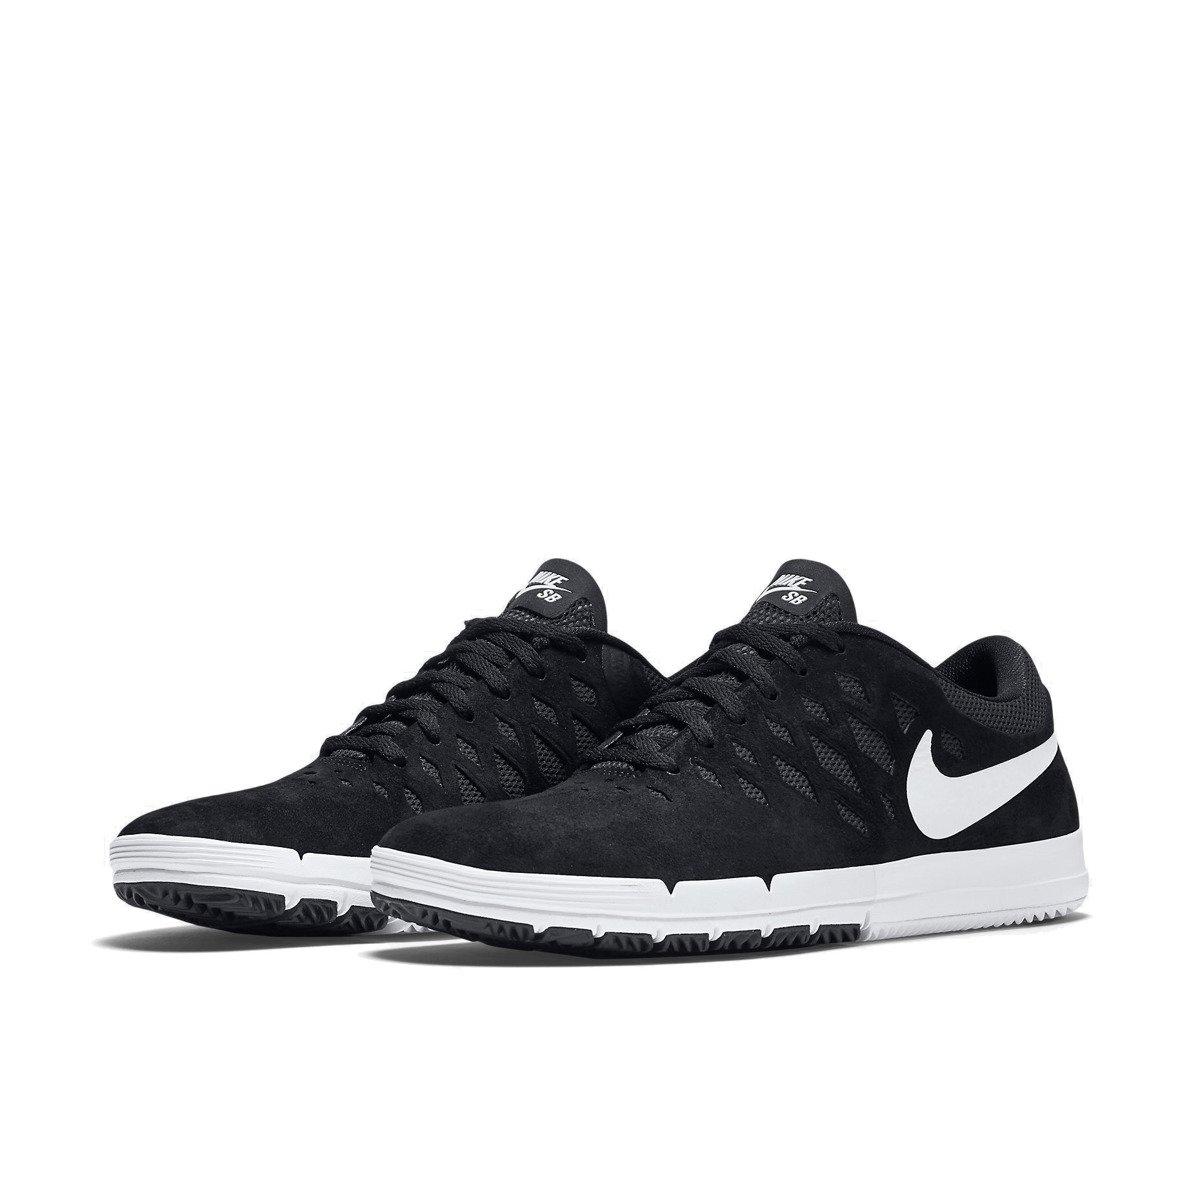 ... Men s Running Shoes. size 9.5 nike shox tlx. nike sb starbucks for sale  free printable coupons ac3635f47